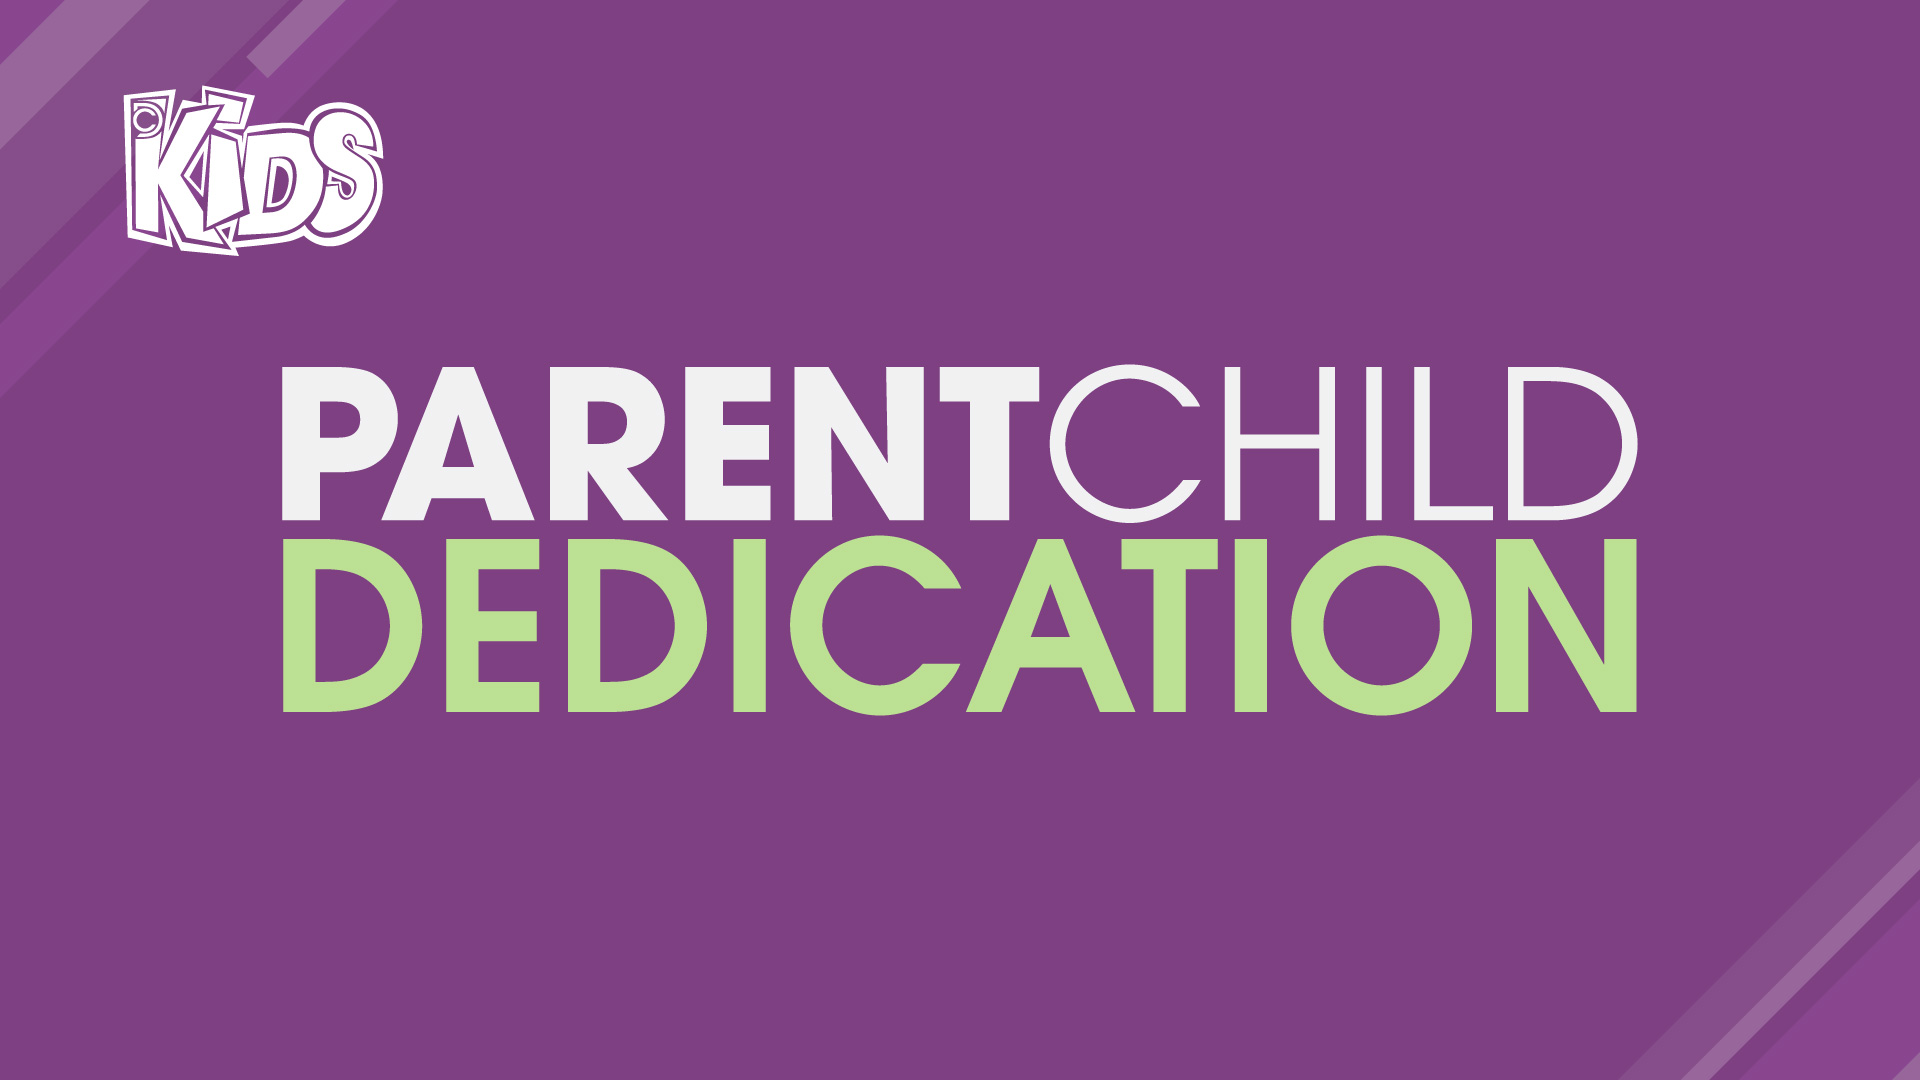 Parentdedication slide 1920x1080